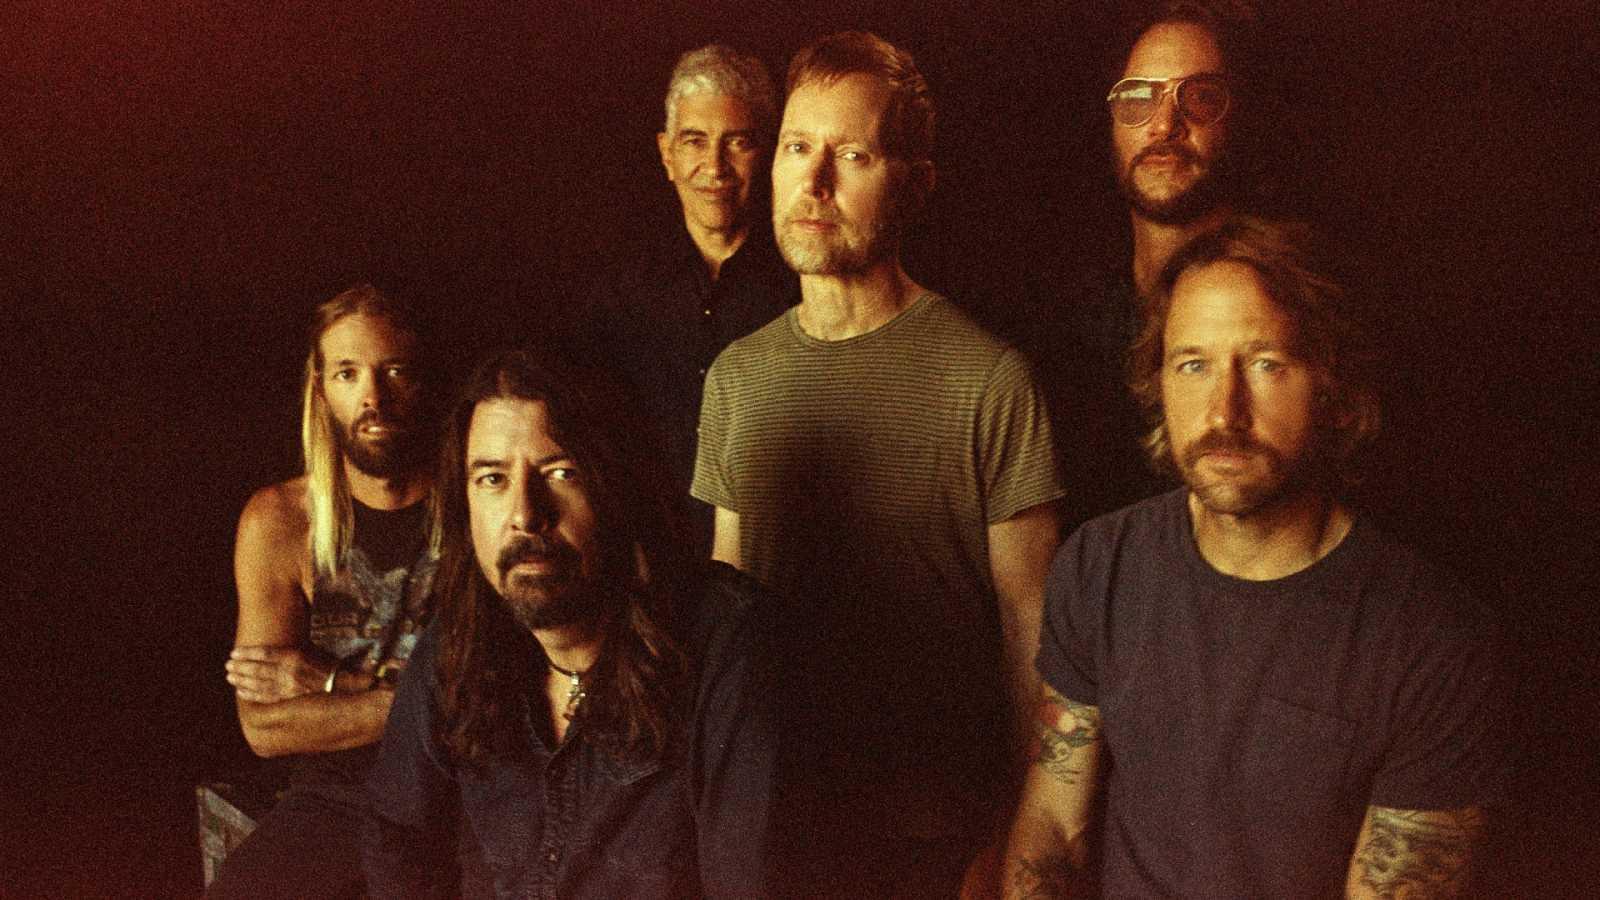 Turbo 3 - Foo Fighters, Nova Waves, Qverno y The Flamingos Bite - 14/01/21 - escuchar ahora